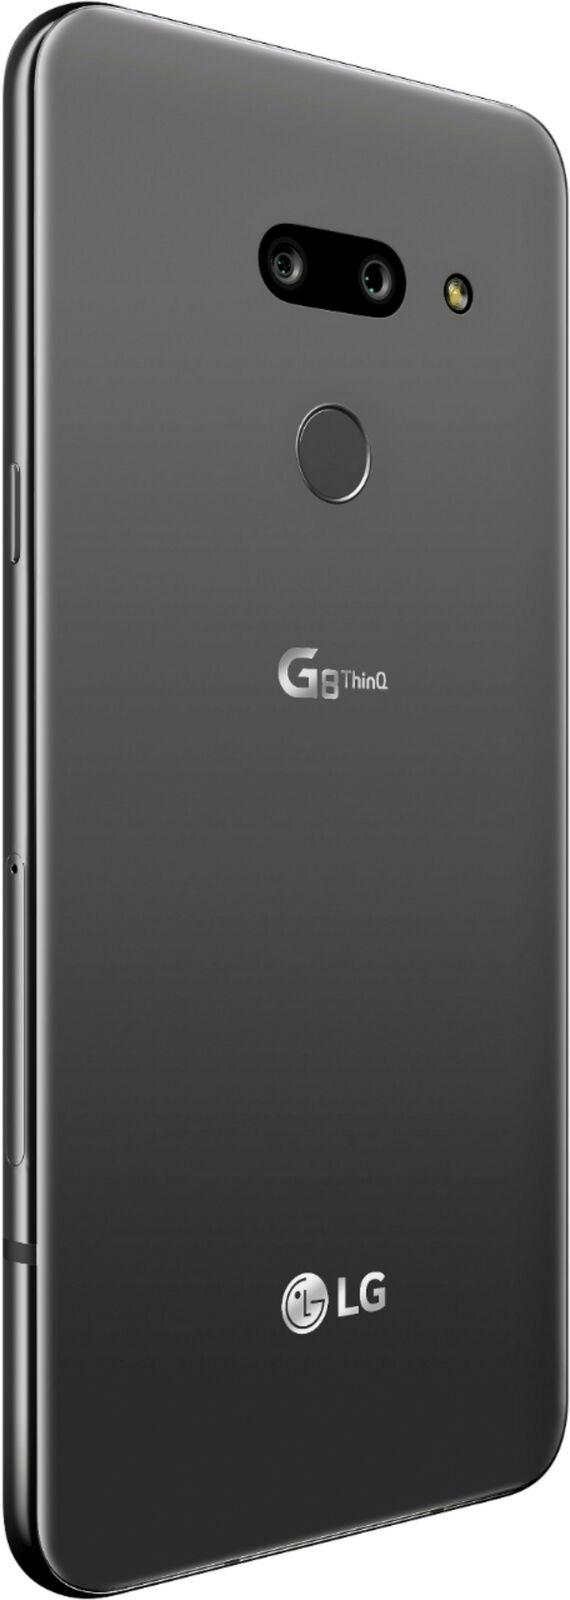 LG G8 ThinQ | Grade A+ | Verizon | Platinum Gray | 128 GB | 6.1 in Screen